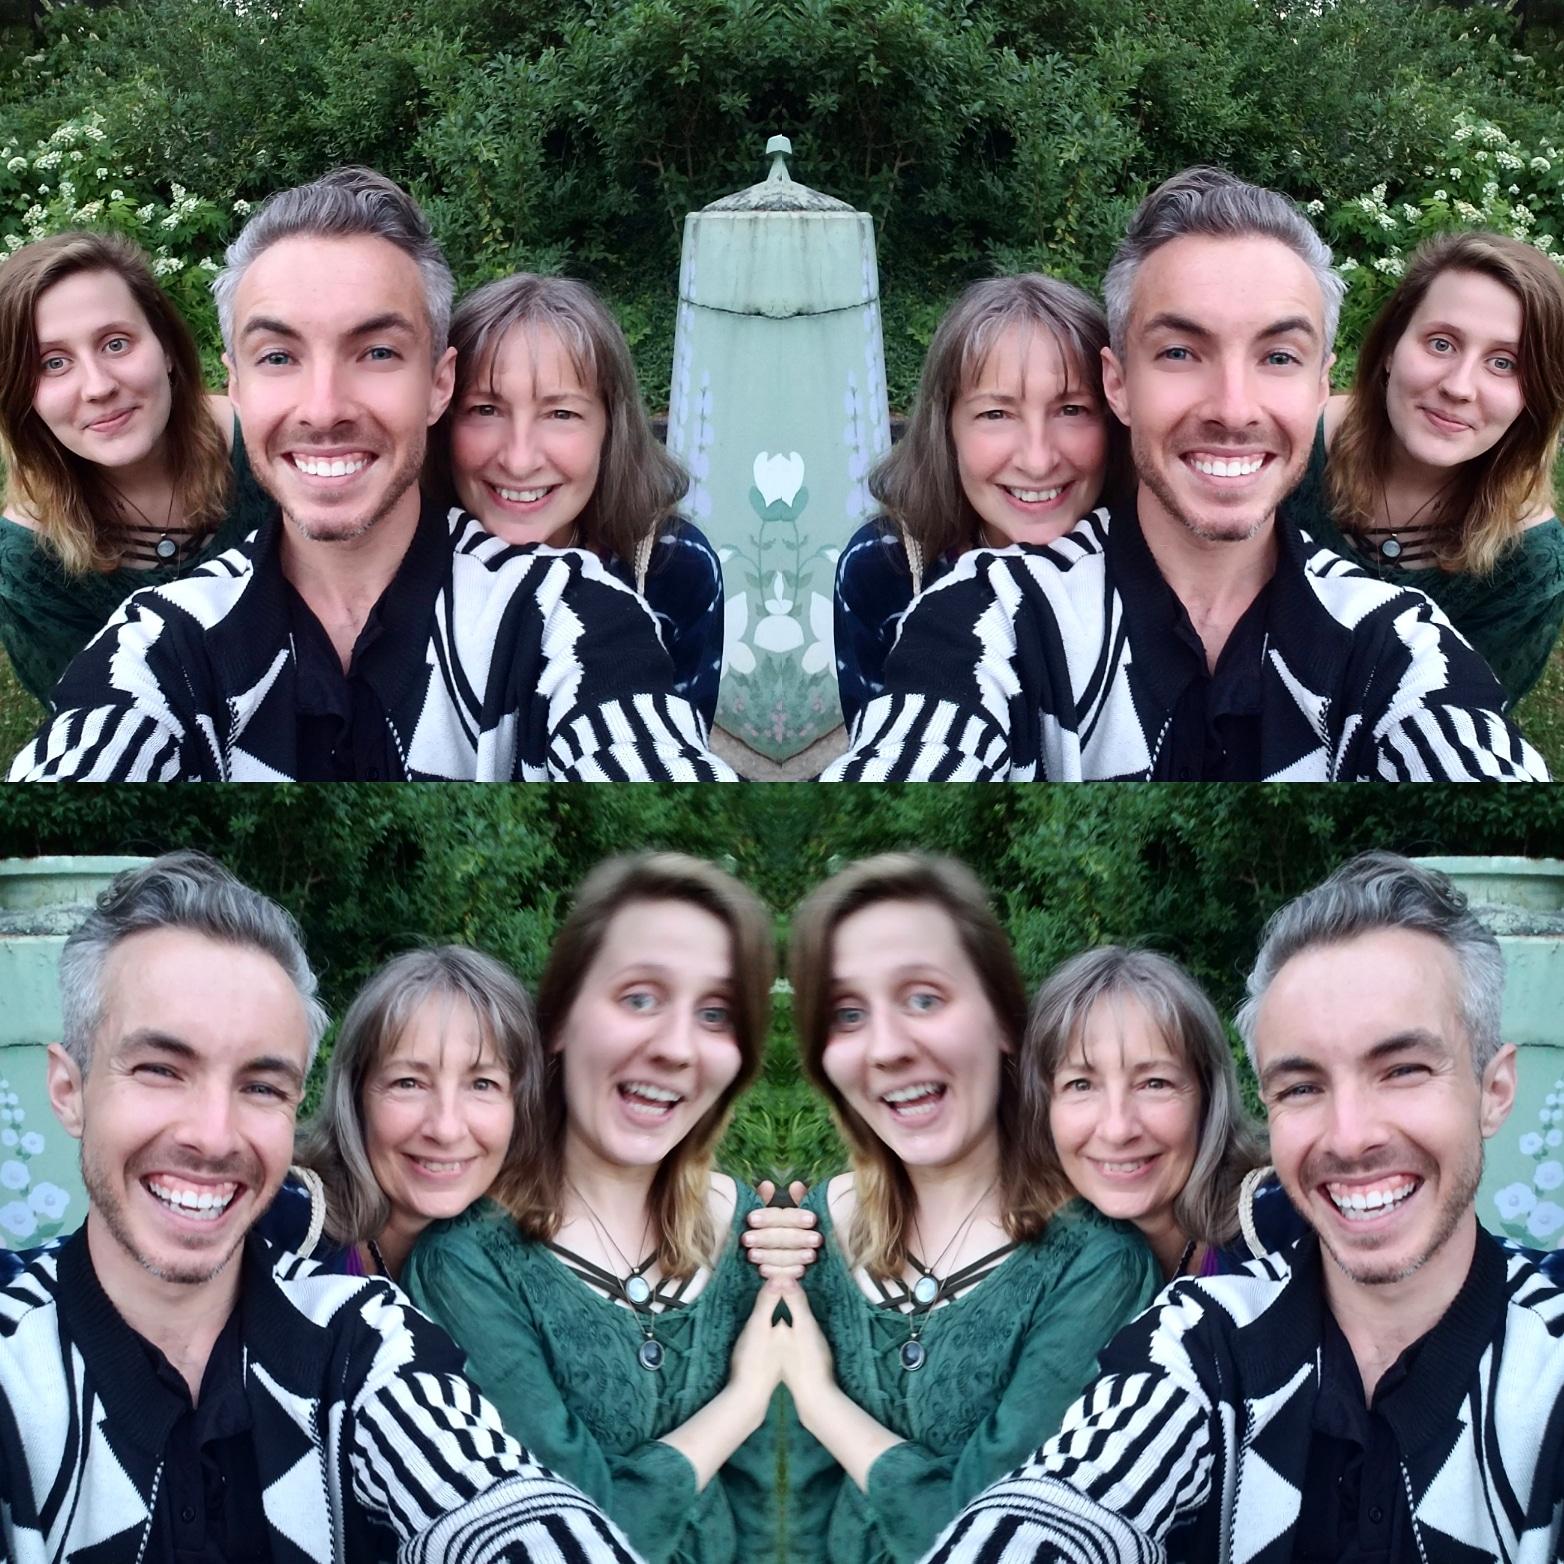 Krissy, Thomas, Alva